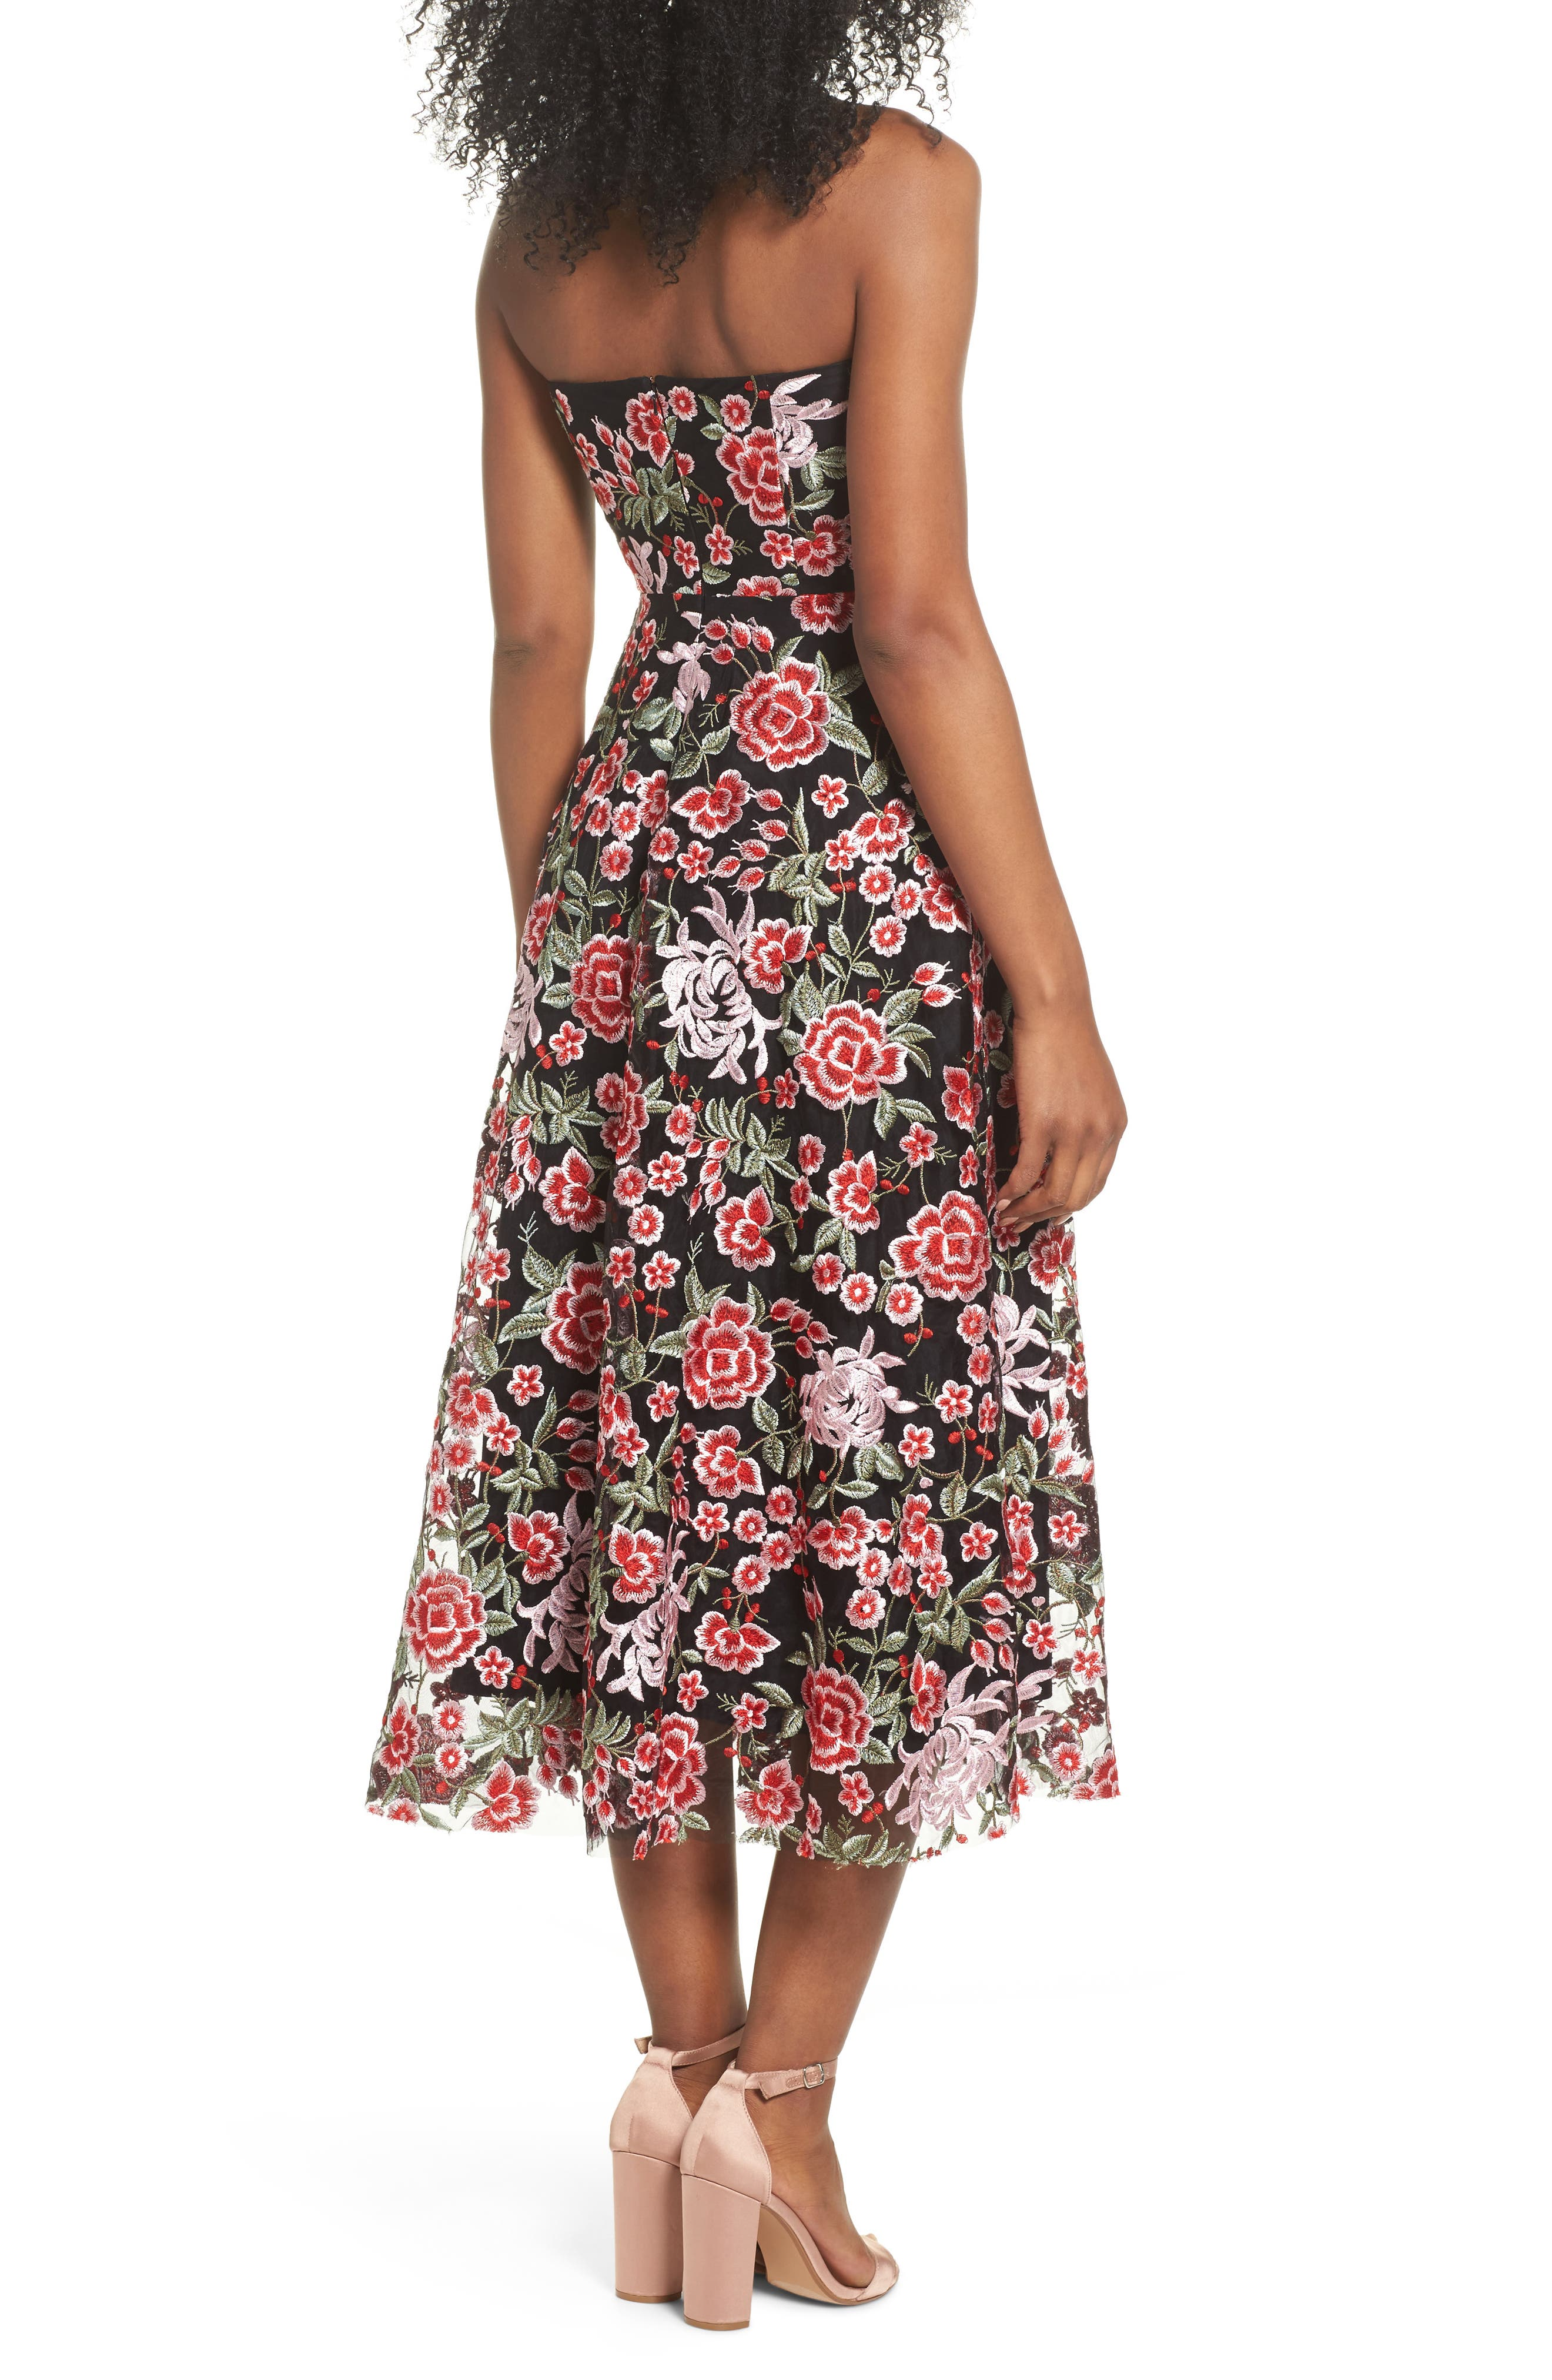 Cosette Embroidered Strapless Dress,                             Alternate thumbnail 2, color,                             Black Multi